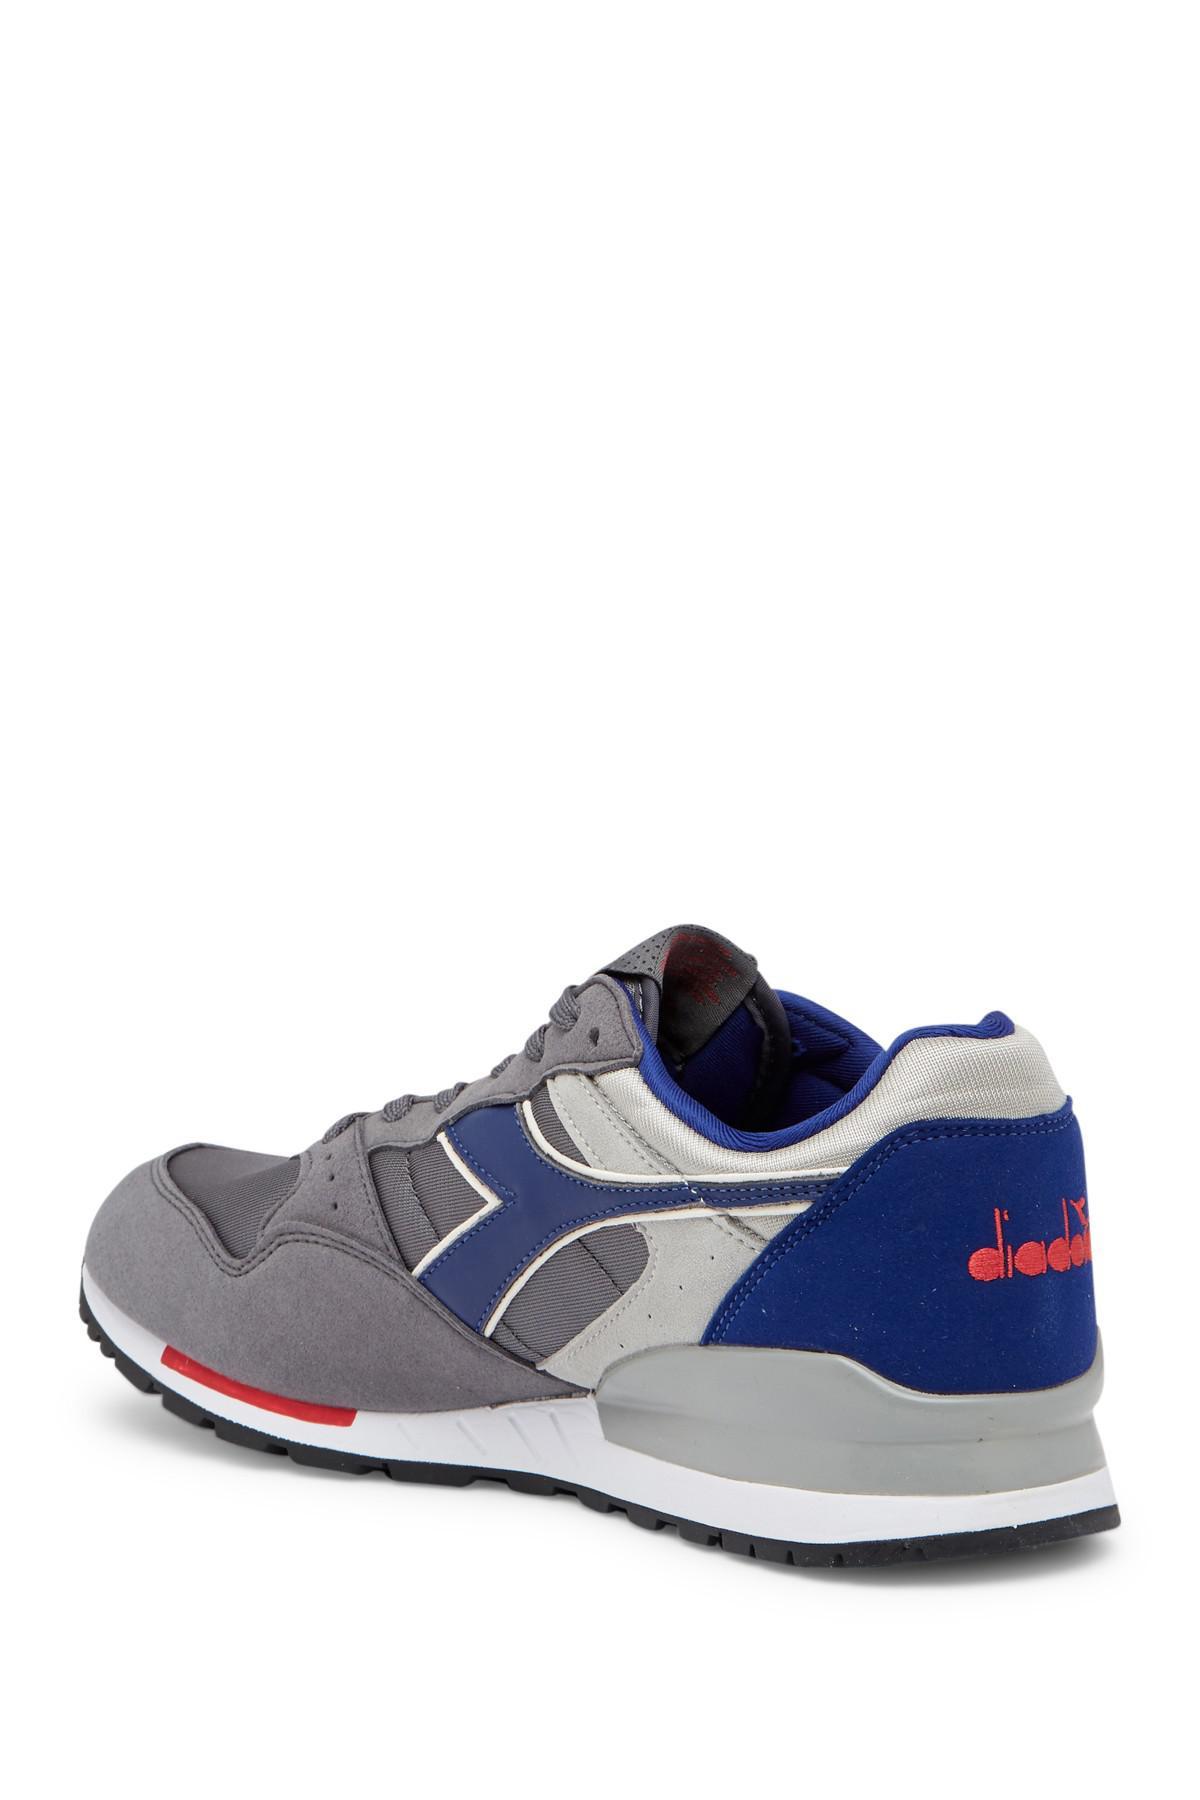 Lyst Diadora Intrepid Nylonleather Sneaker in Blue for Men